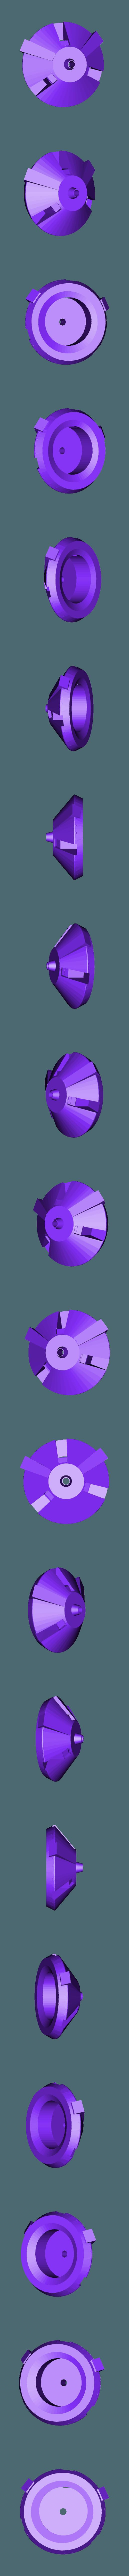 tobor bottom.stl Download STL file taybors ship space 1999 • 3D printable design, platt980